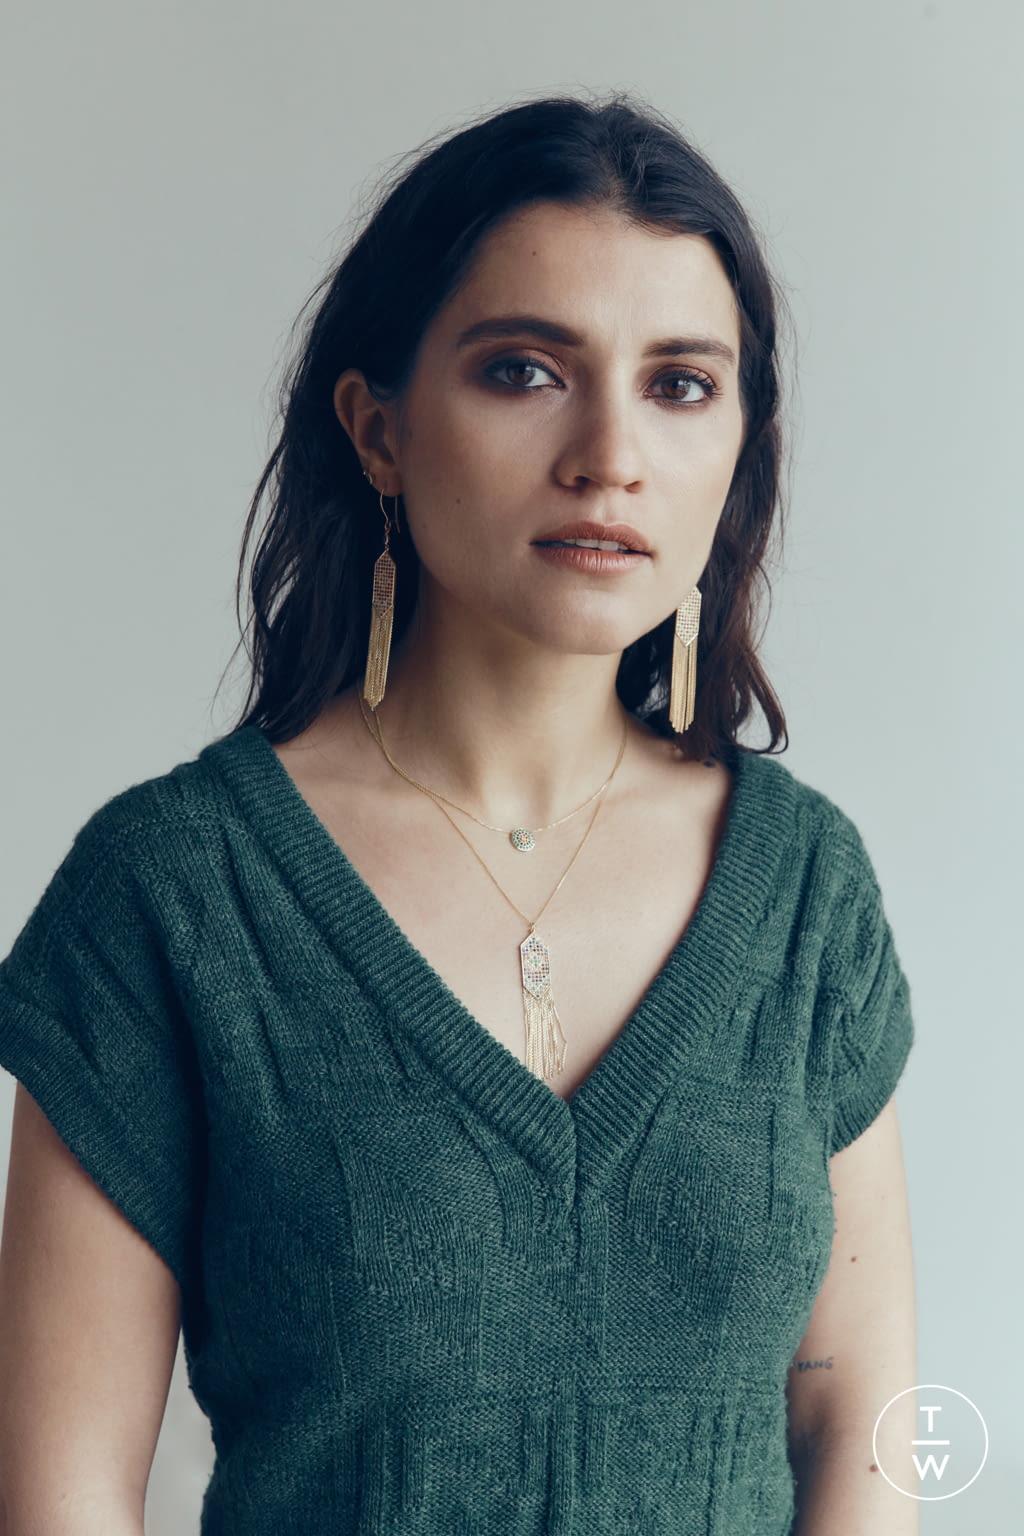 Fashion Week Paris Fall/Winter 2019 look 1 de la collection Sophie d'Agon womenswear accessories